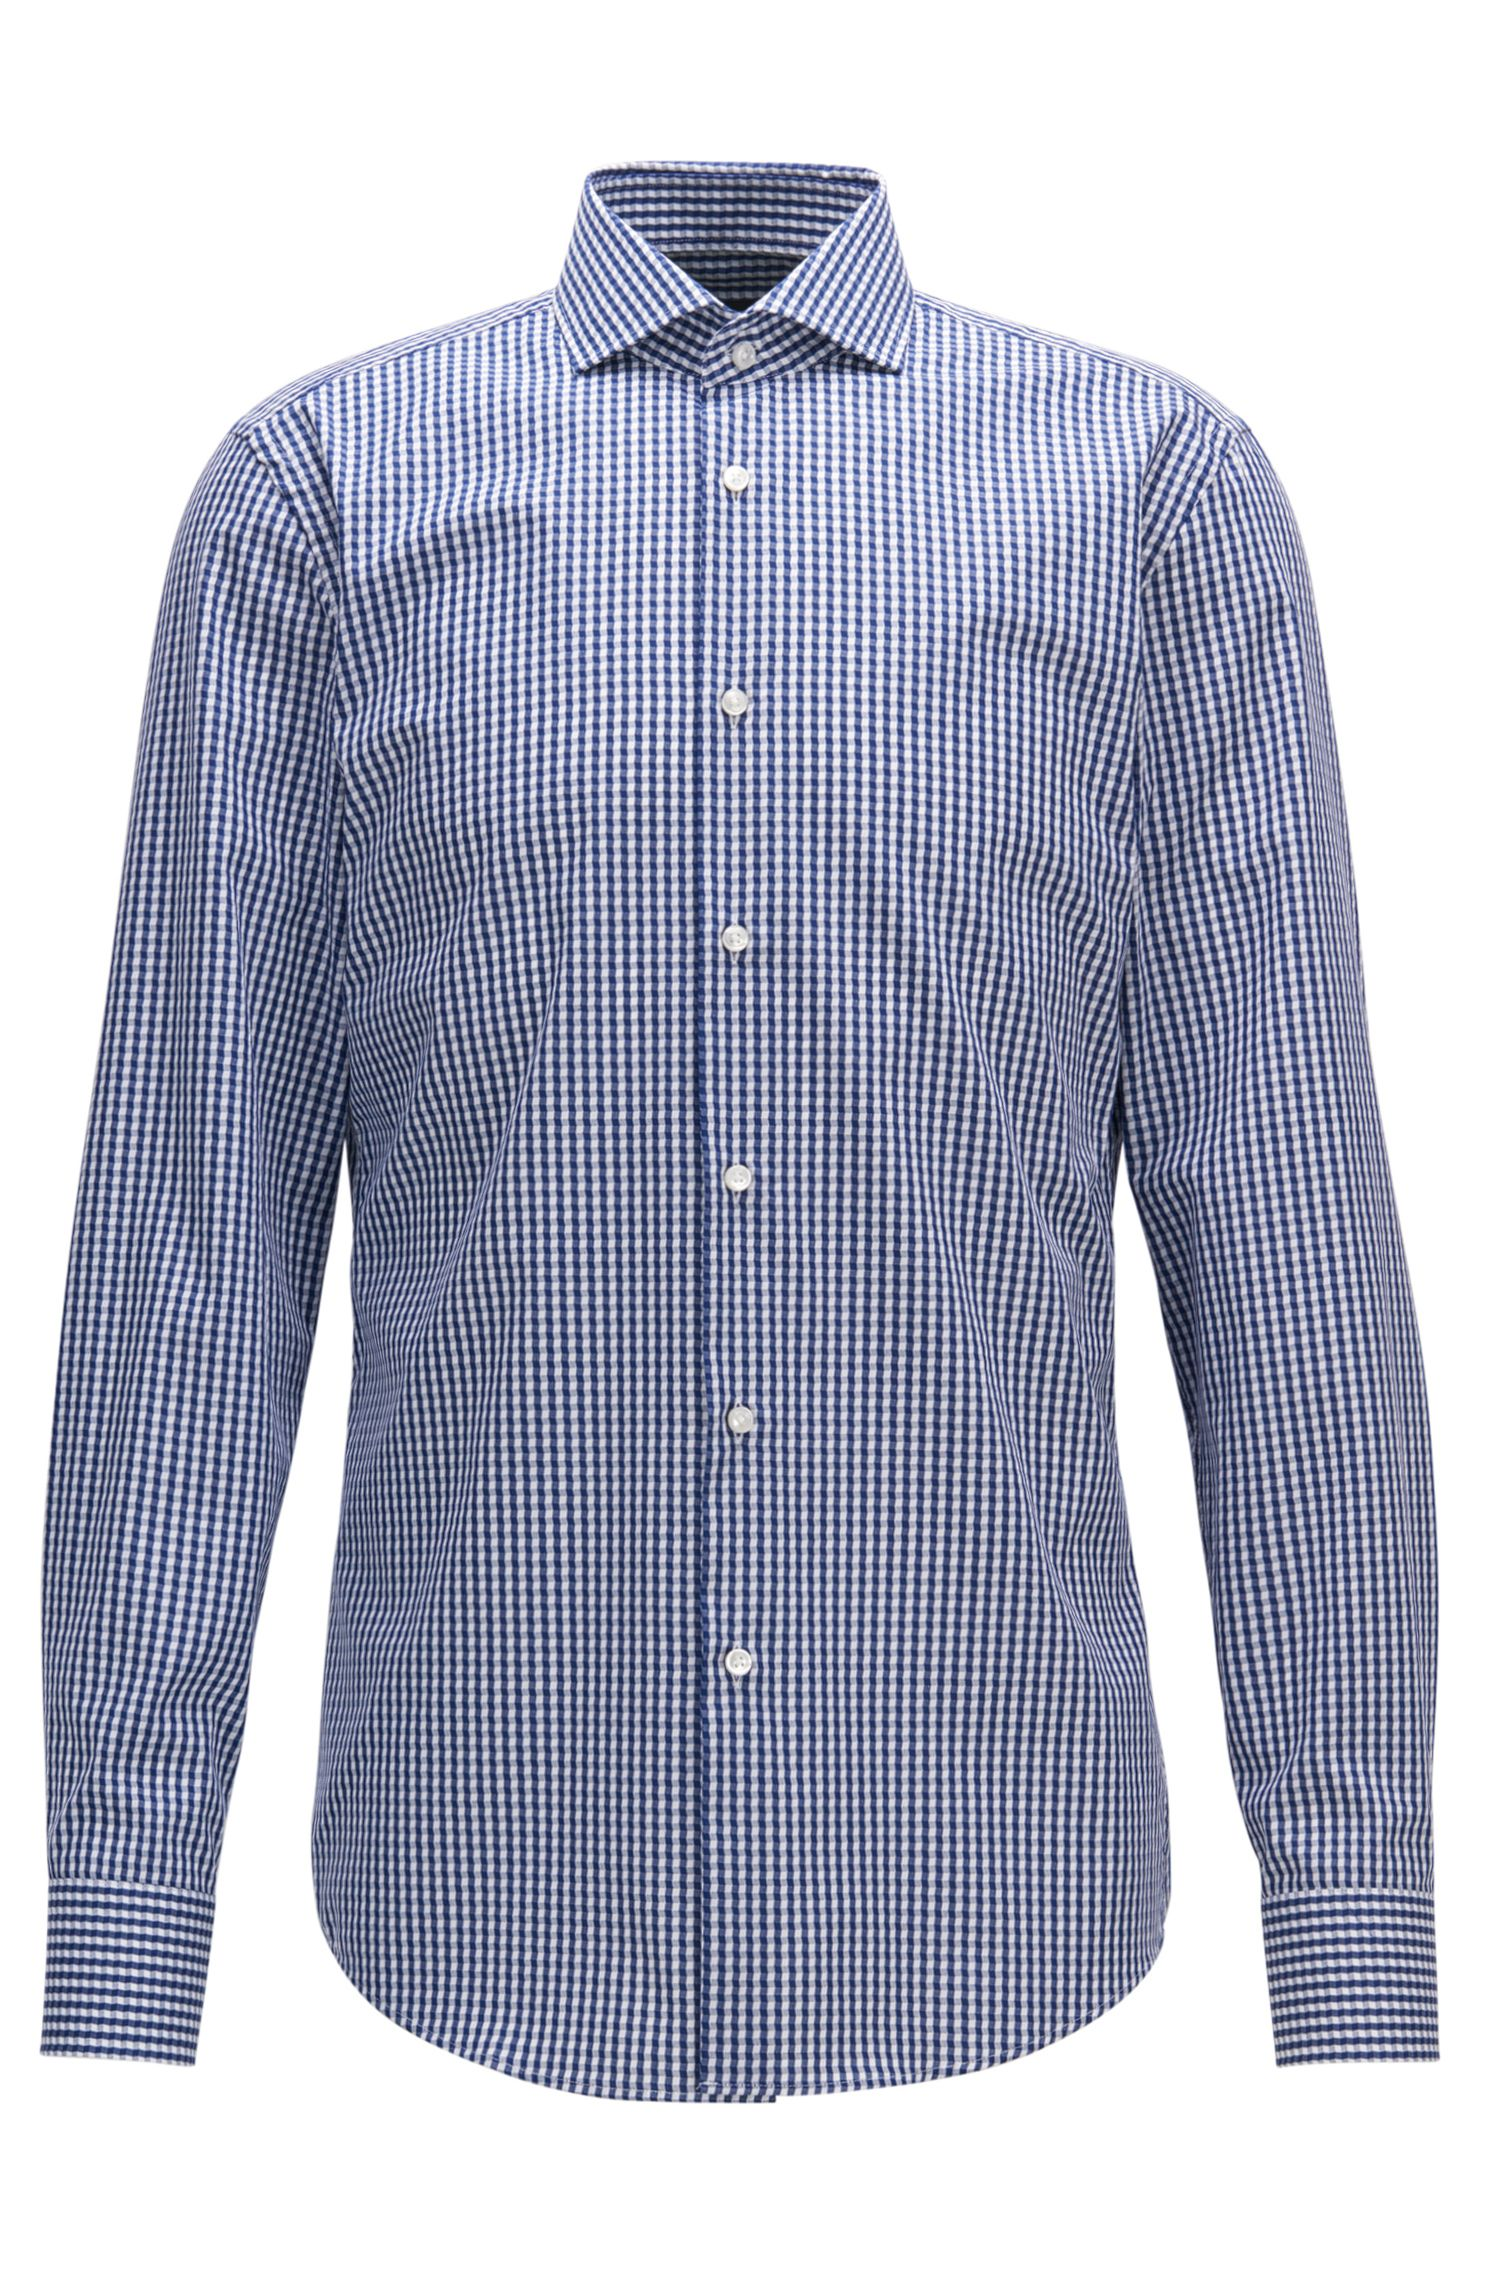 Irregular Gingham Cotton Dress Shirt, Slim Fit | Jason